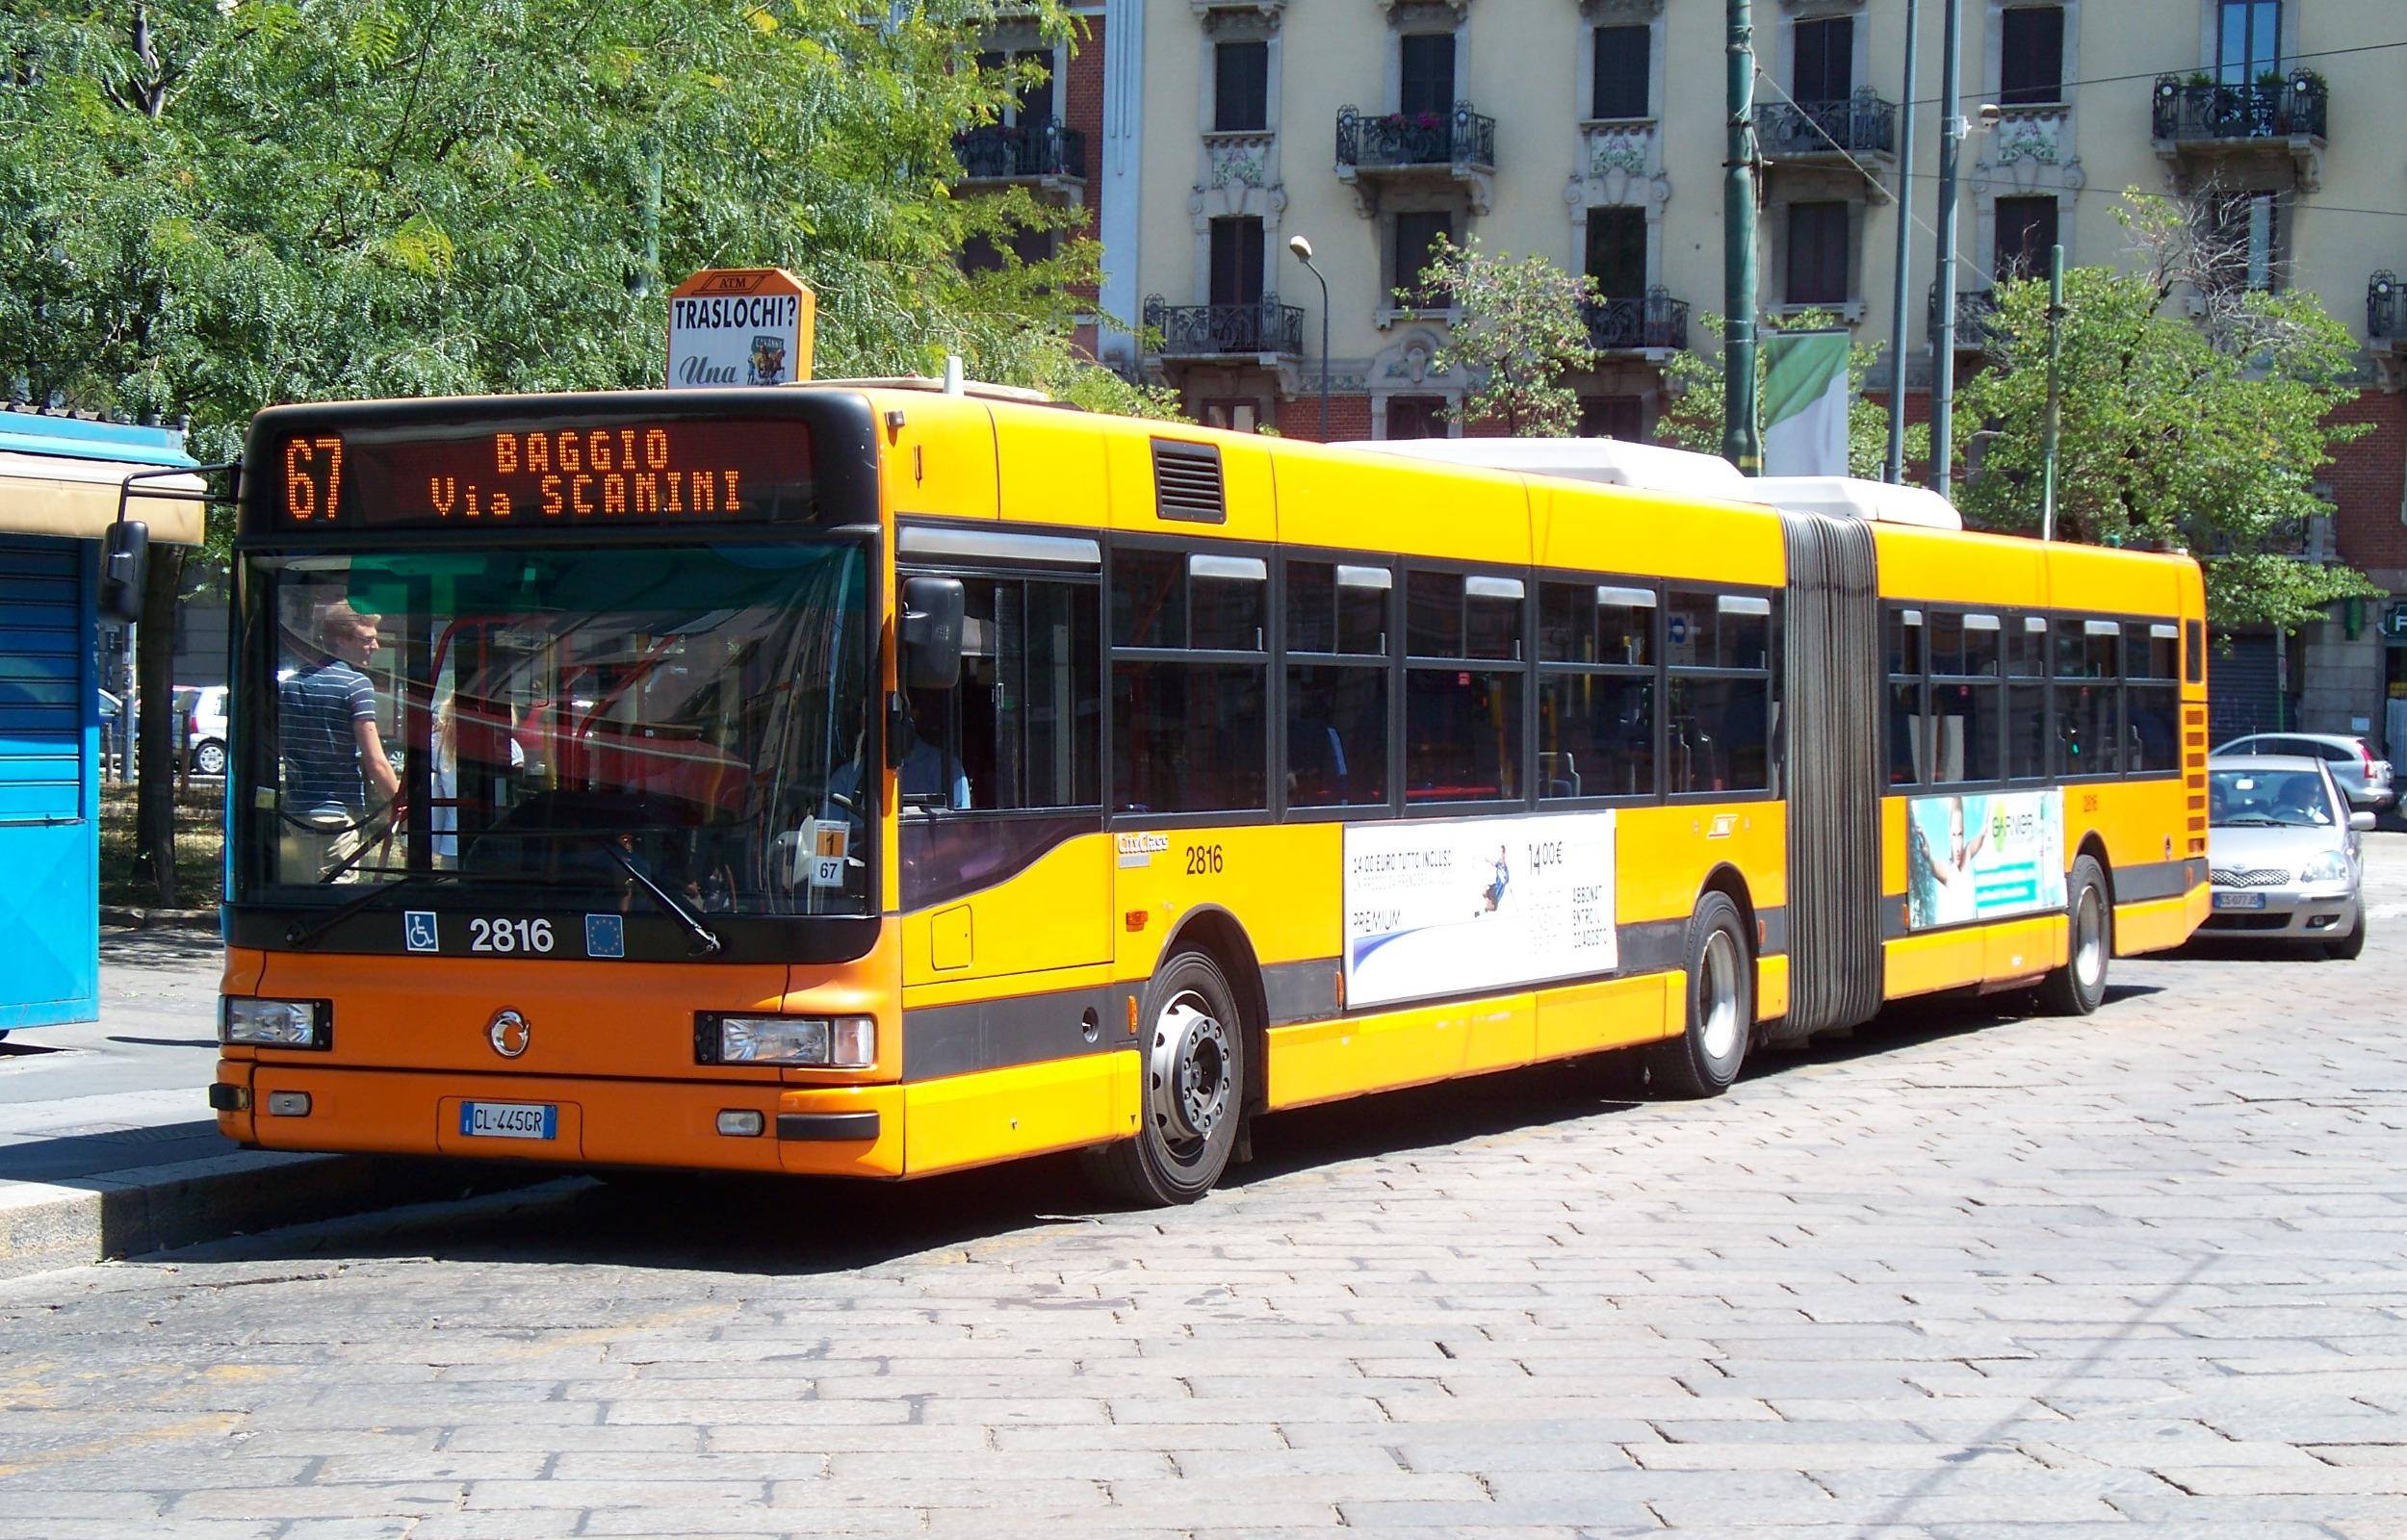 Public_bus_in_Milan,_Italy.JPG